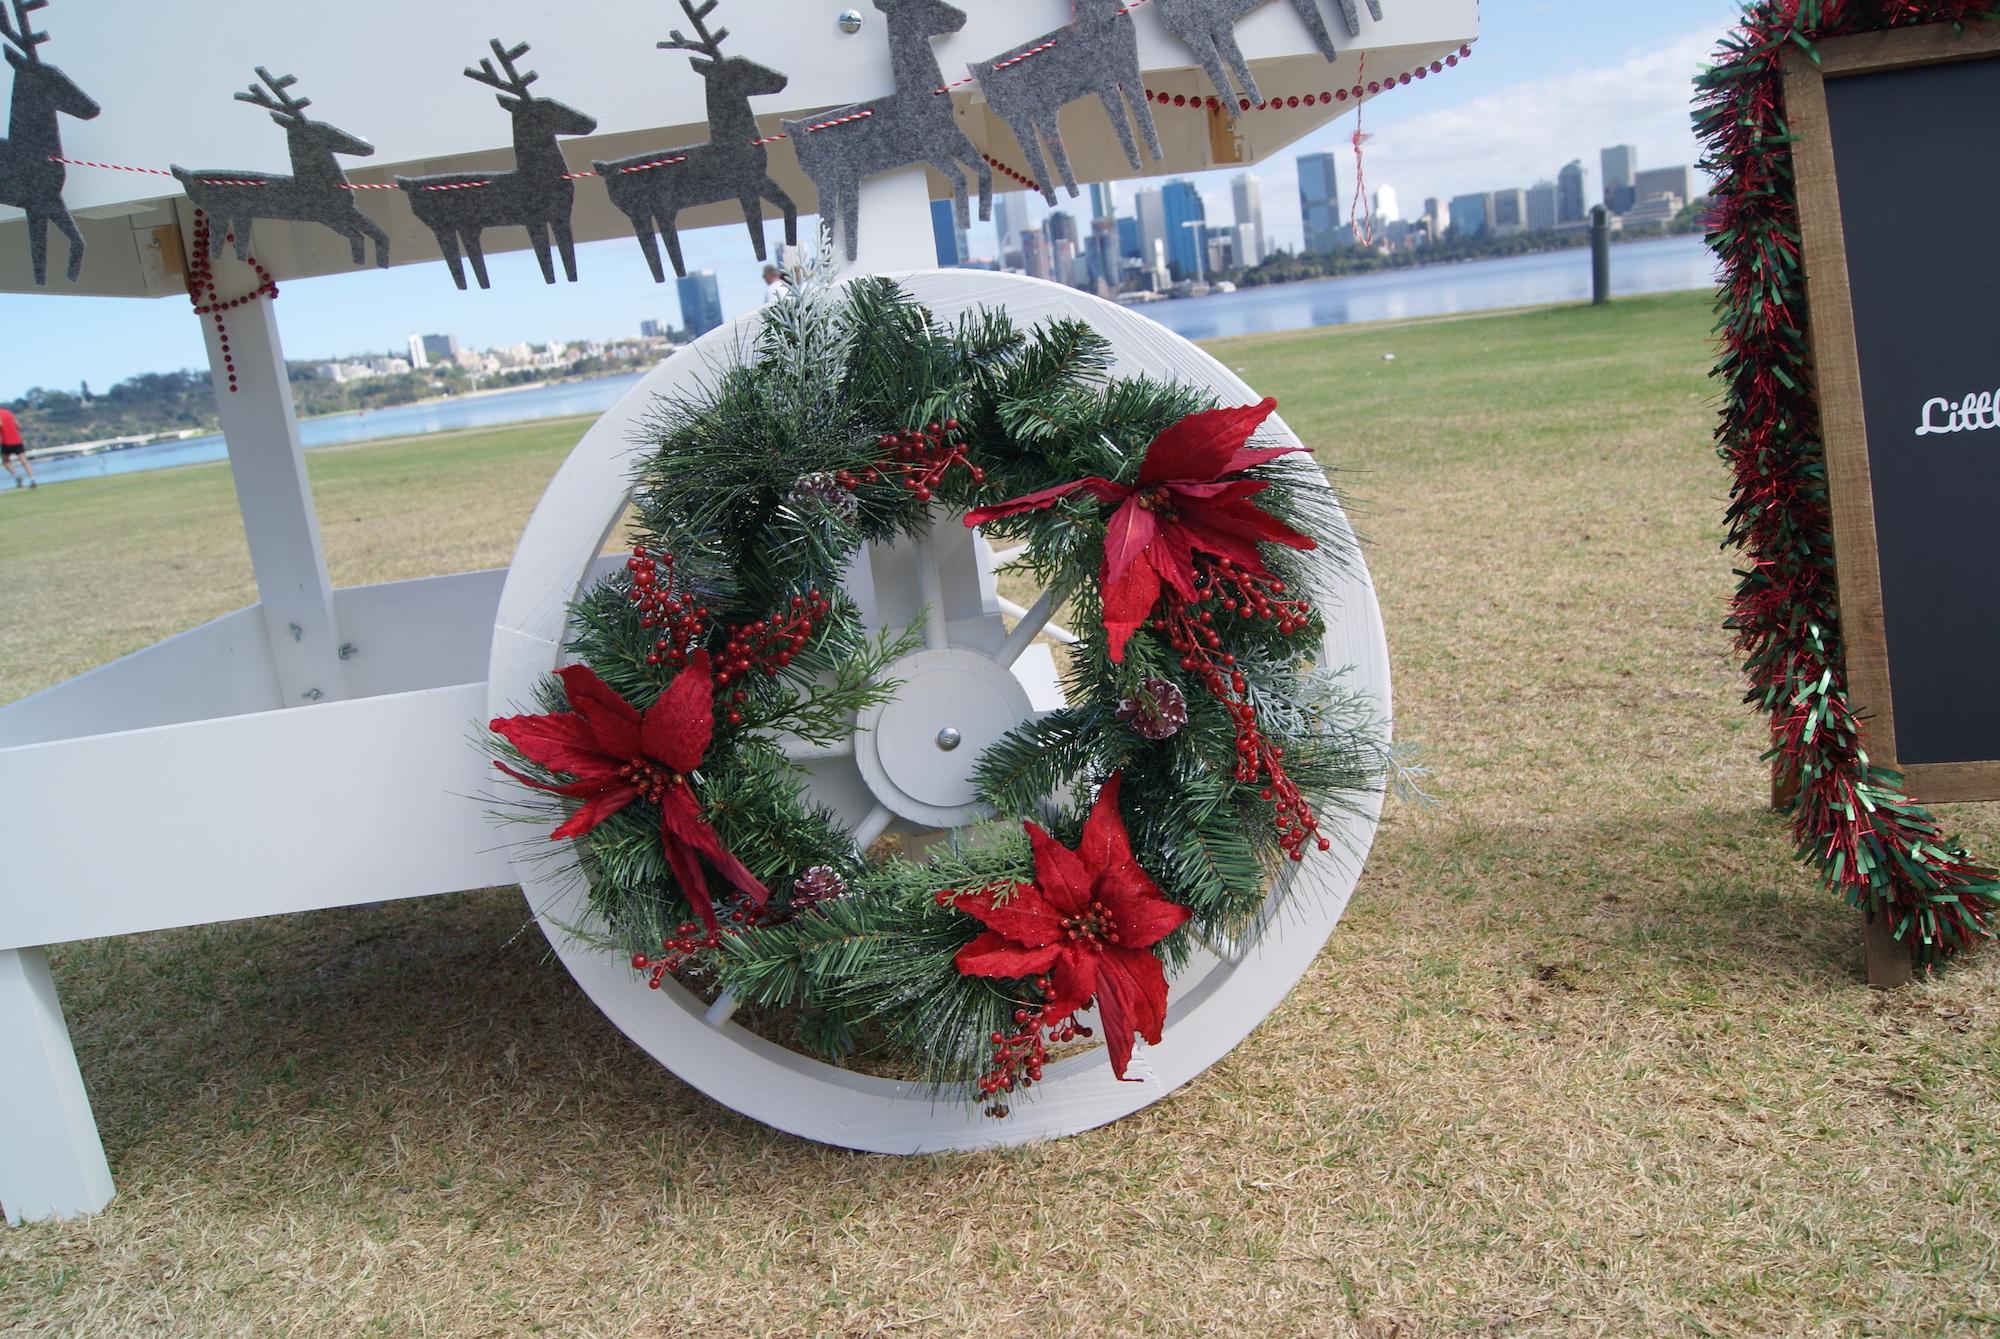 Wreath_Wheel_Little_Lolly_Cart_Christmas_Cart_Hire.JPG